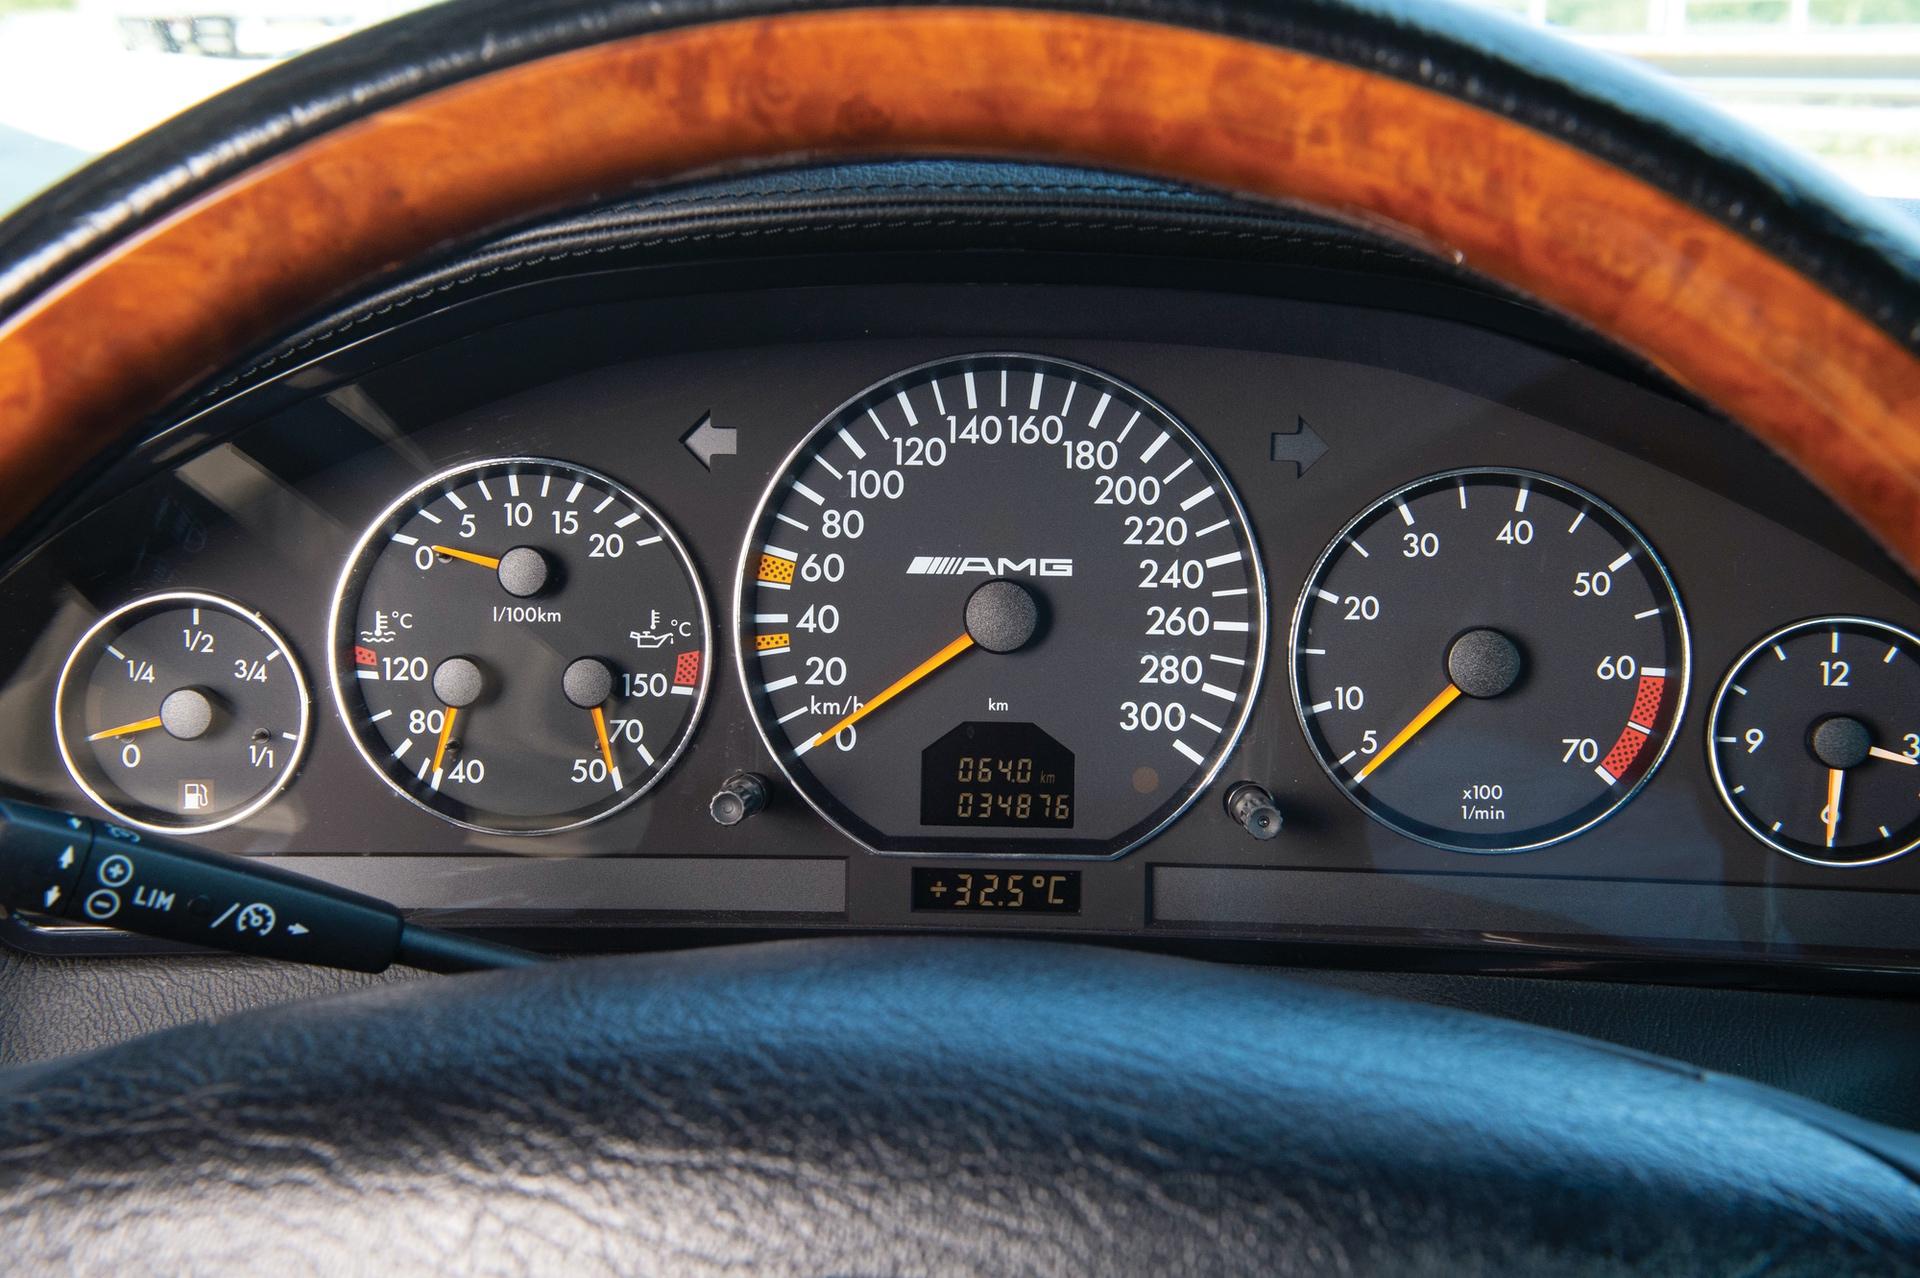 1999-Mercedes-Benz-SL-73-AMG-_10